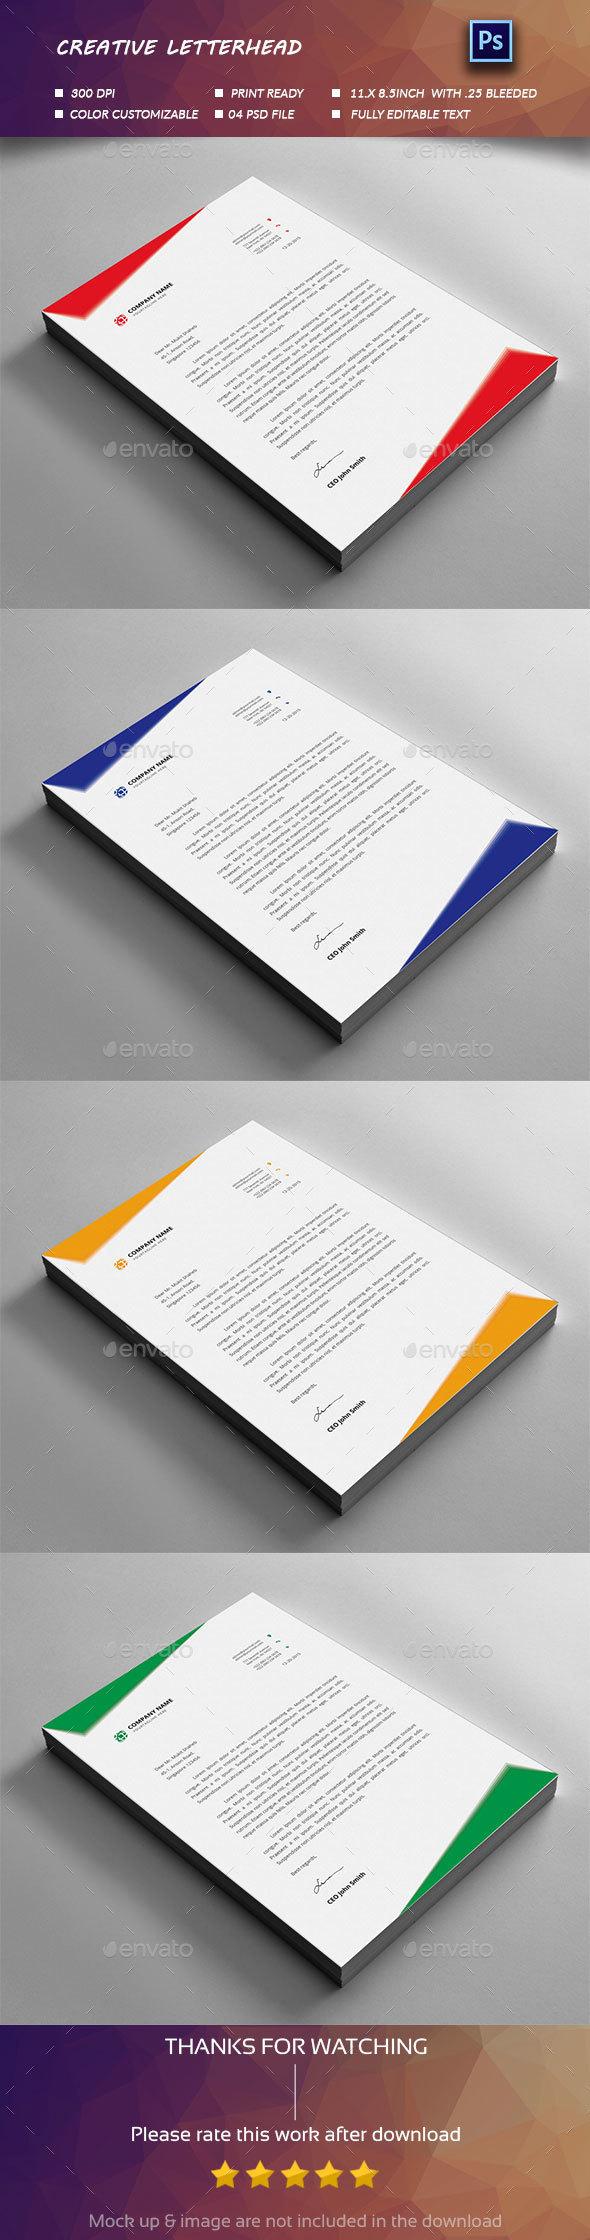 Letterhead Design Graphics, Designs & Templates